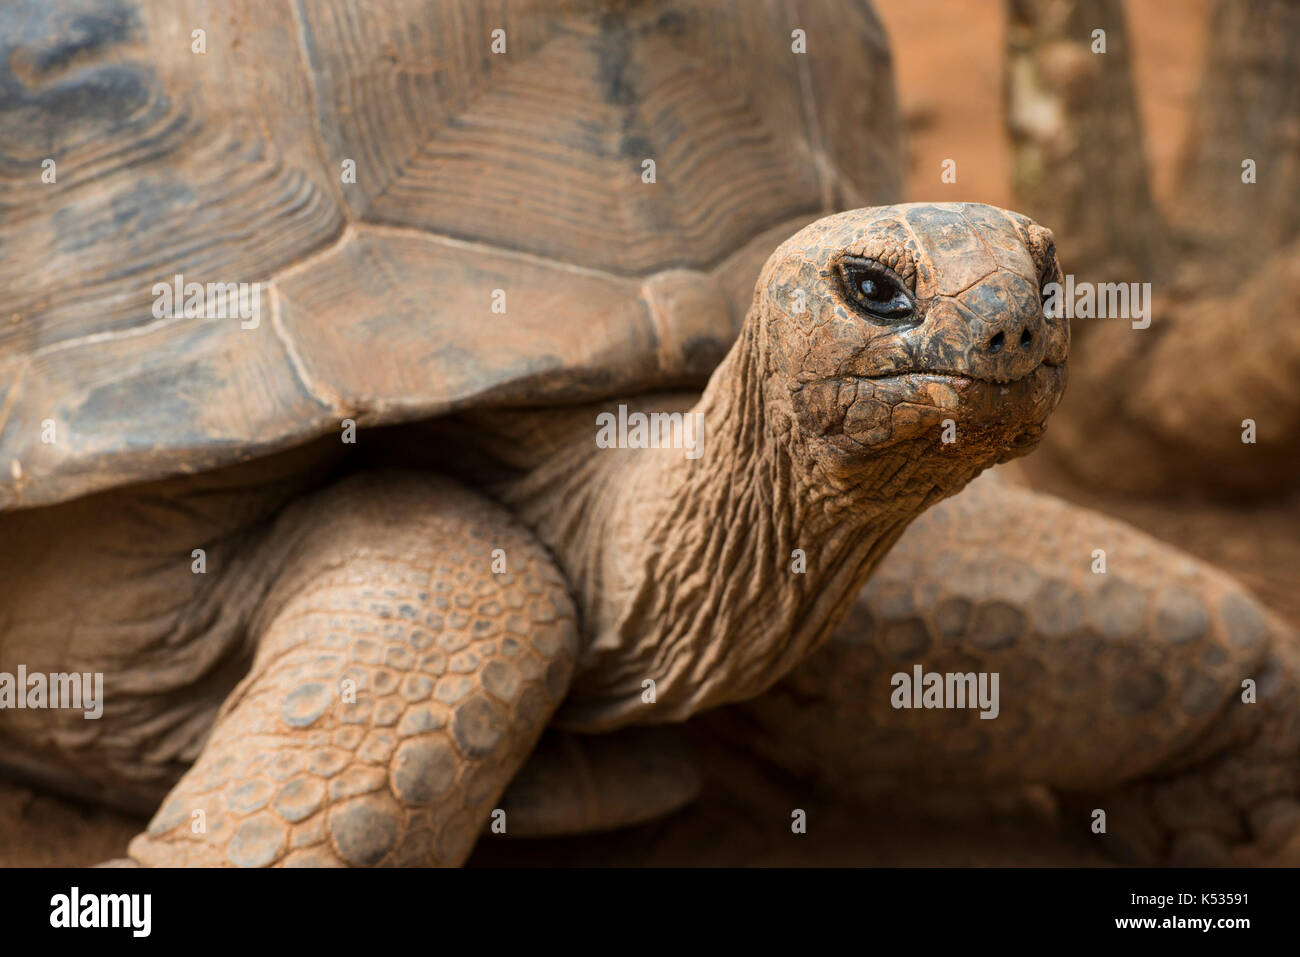 Radiated tortoise, Astrochelys radiata, Croc Farm, Antananarivo, Madagascar - Stock Image